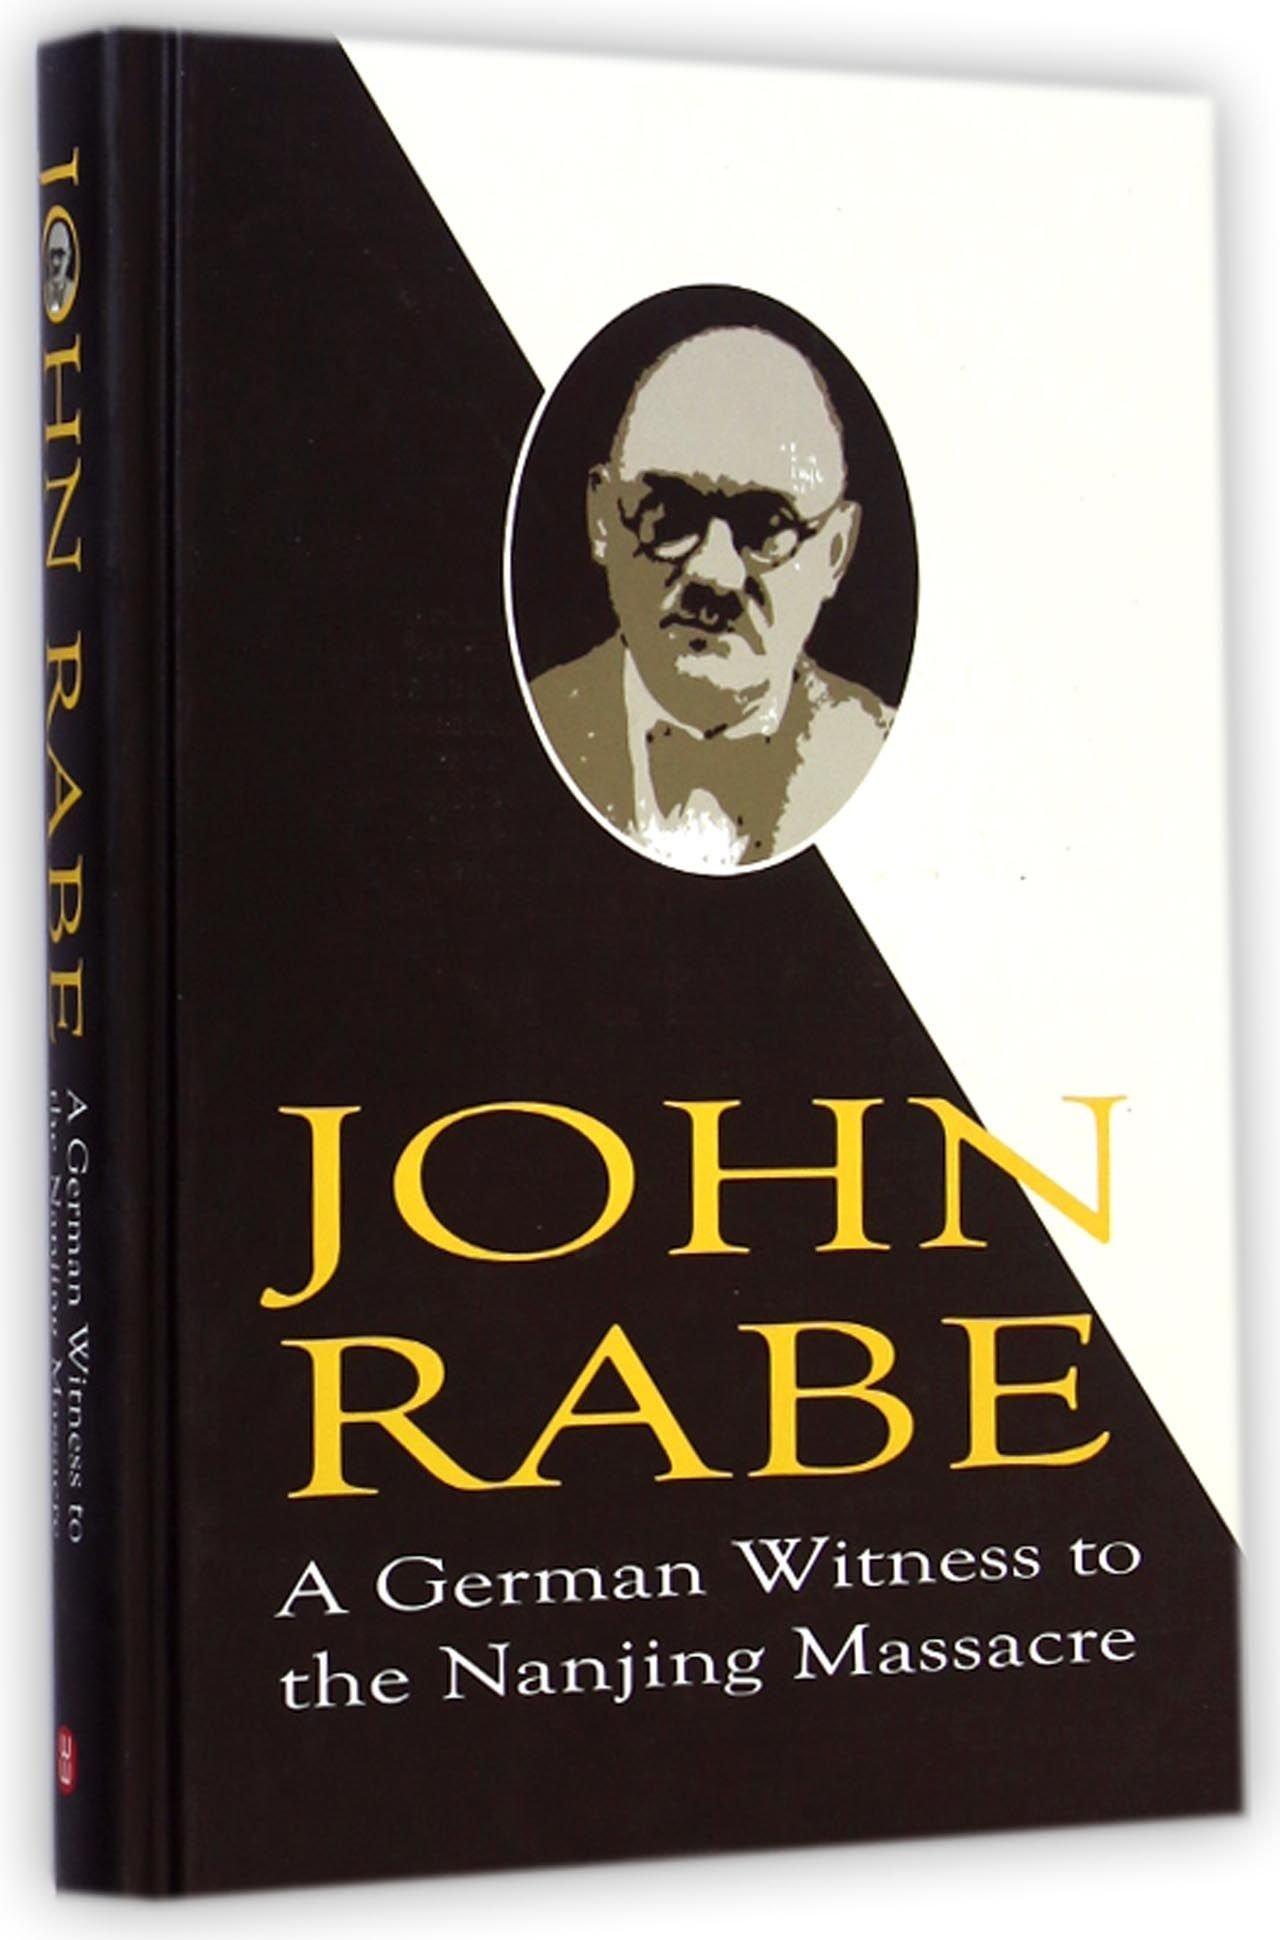 John Rabe: A German Witness to the Nanjing Massacre